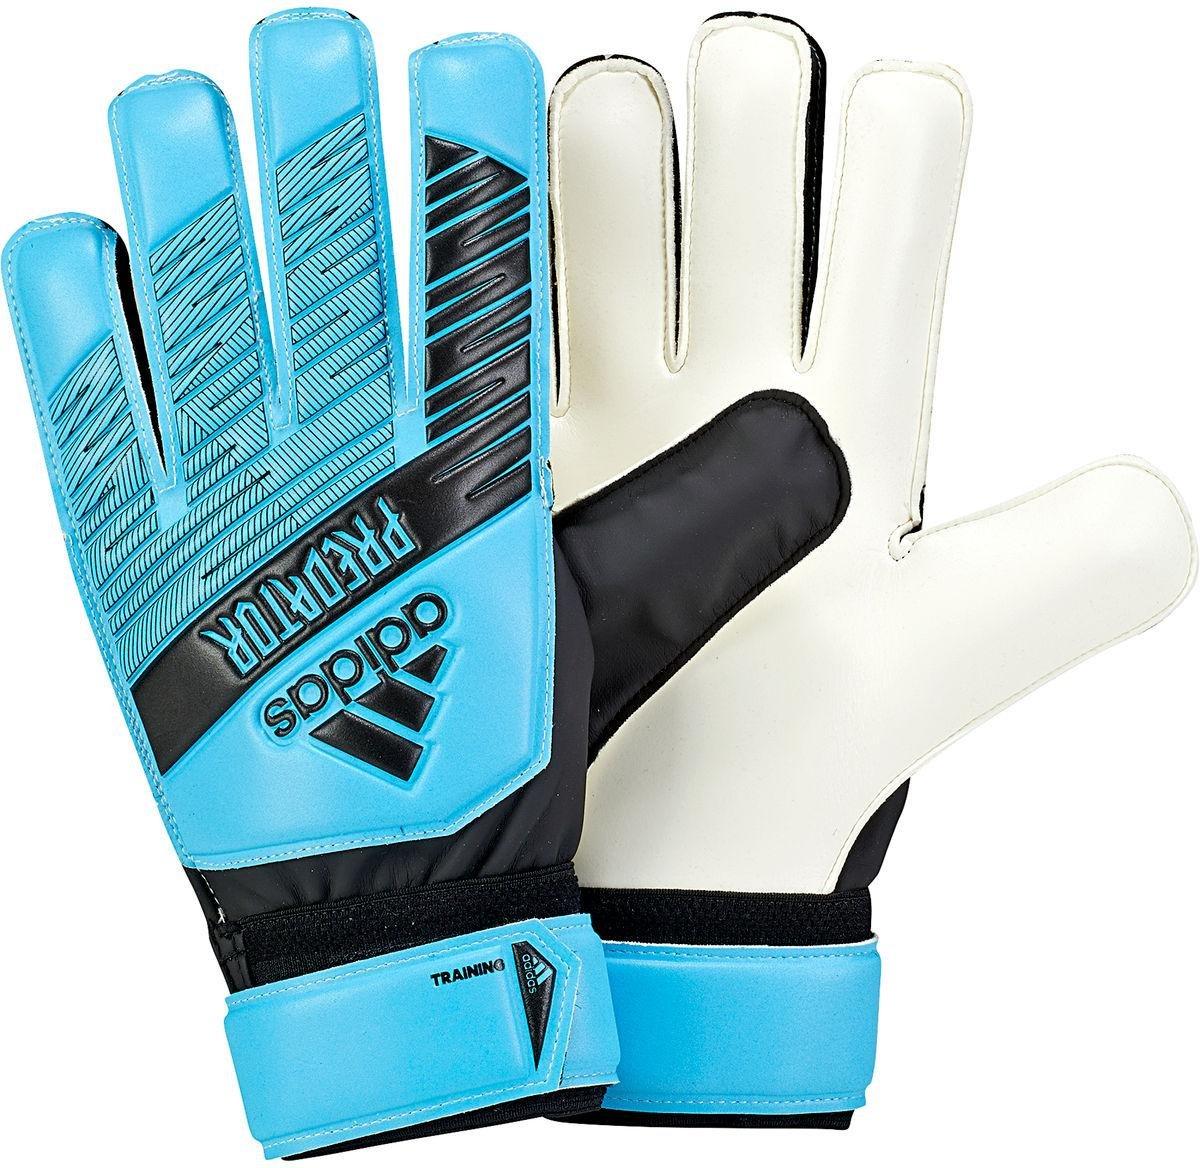 Brankářské rukavice adidas PRED TRN dy2615 Velikost 9,5